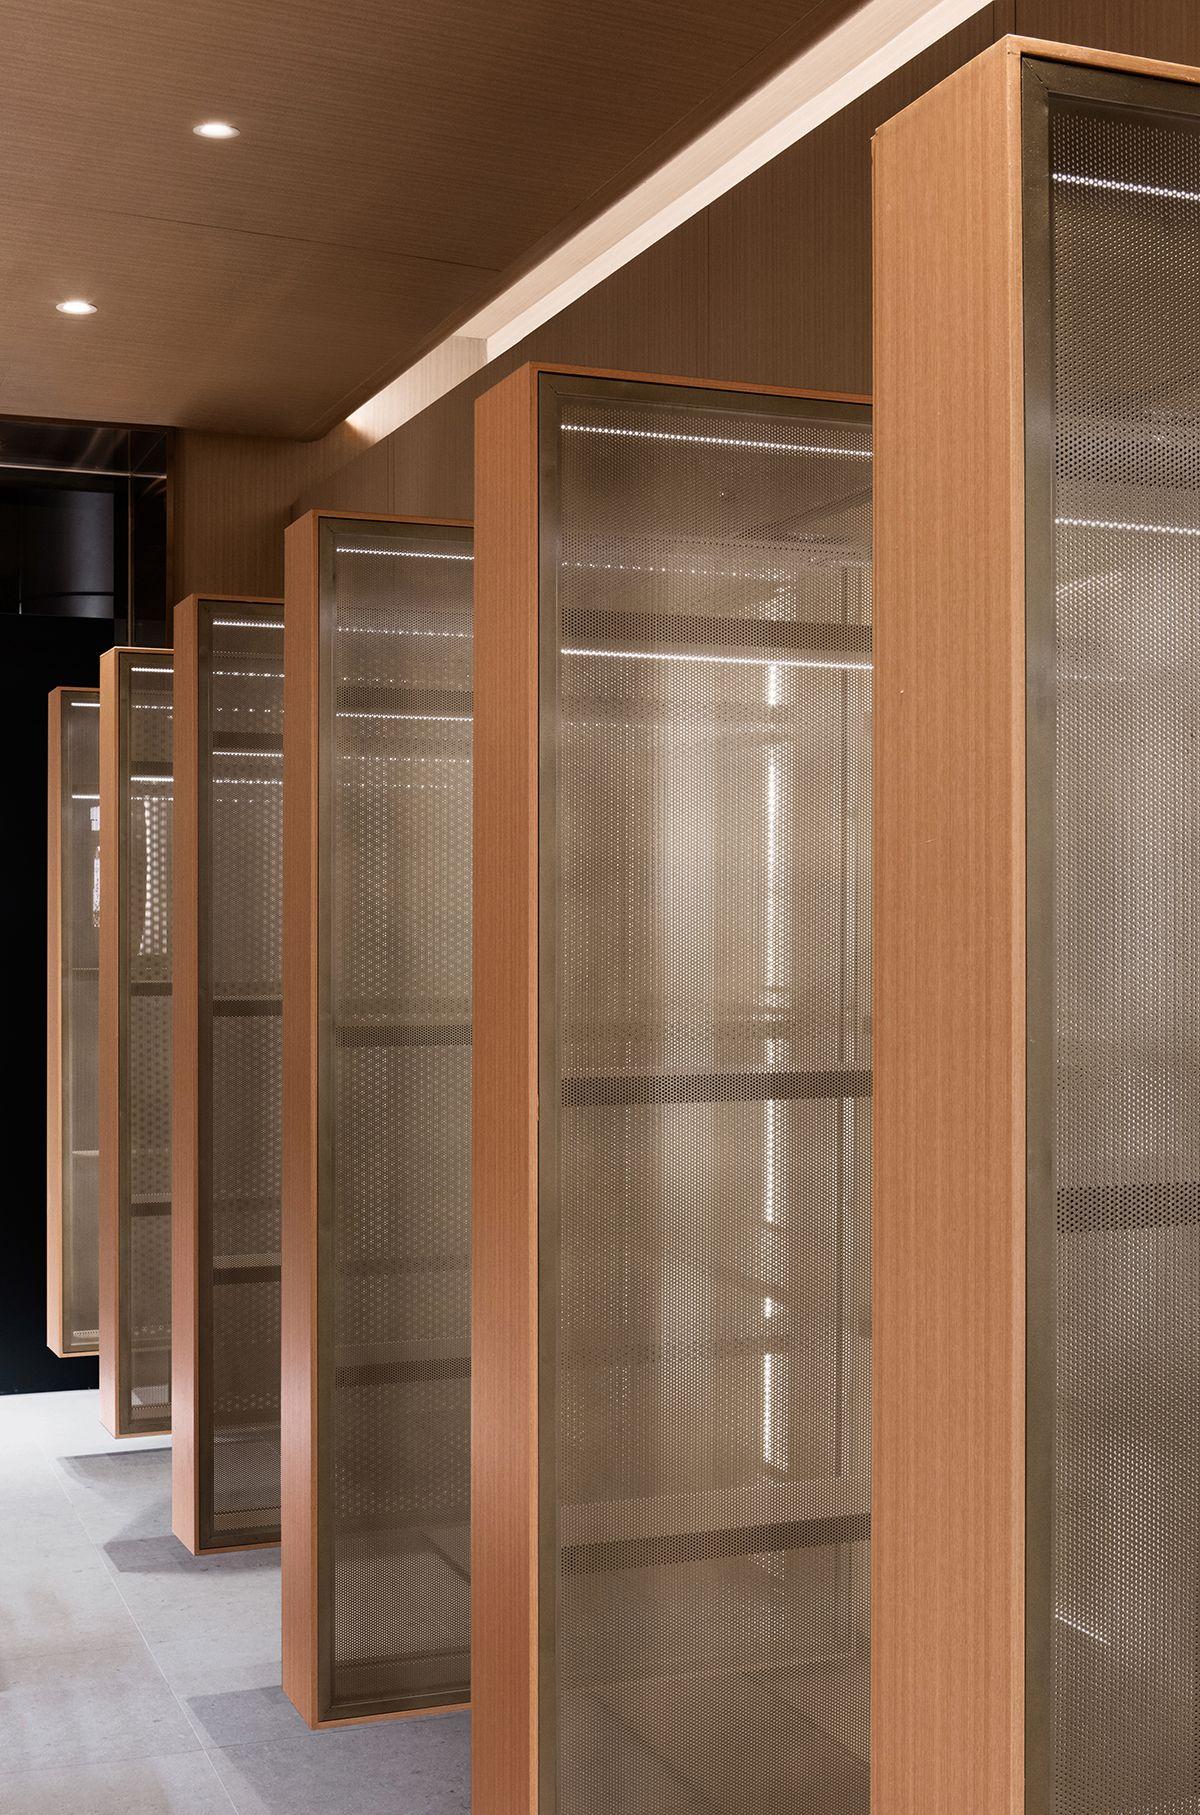 Endo Room Design: Idea By Endo Kuala Lumpur On Retail / Boutique